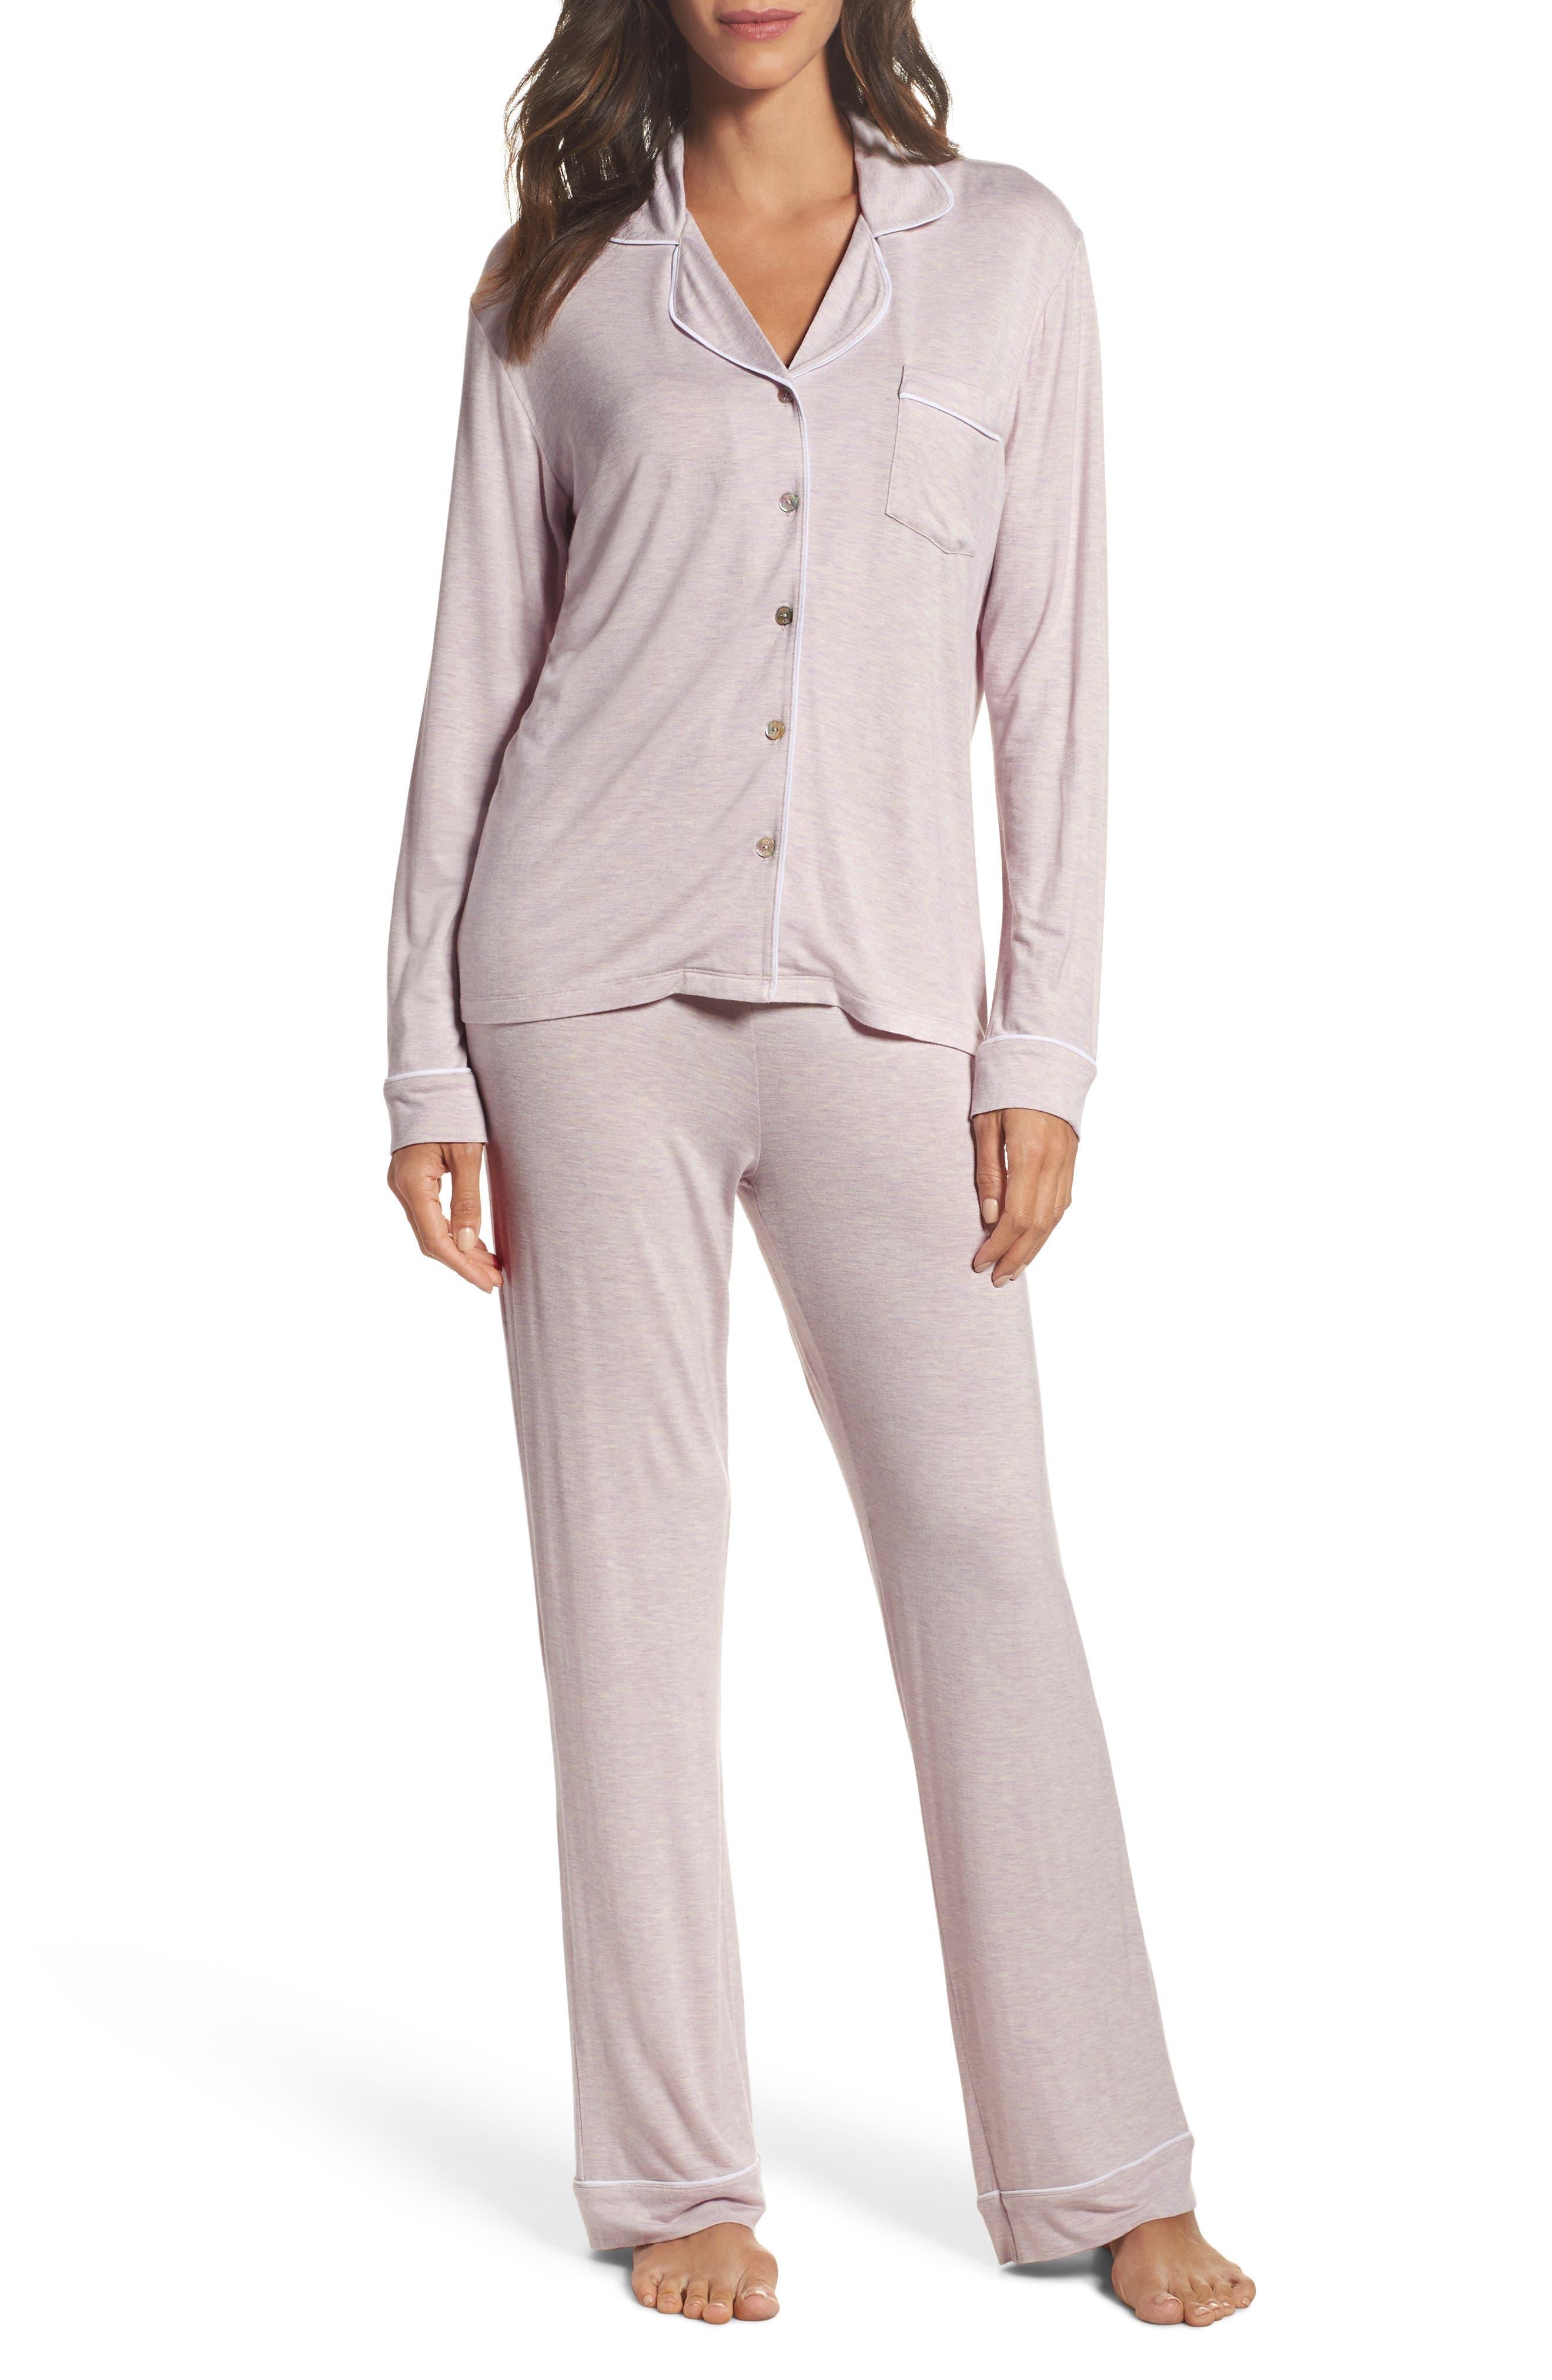 Lenon Jersey Pajamas,                         Main,                         color, Lavender Fog Heather